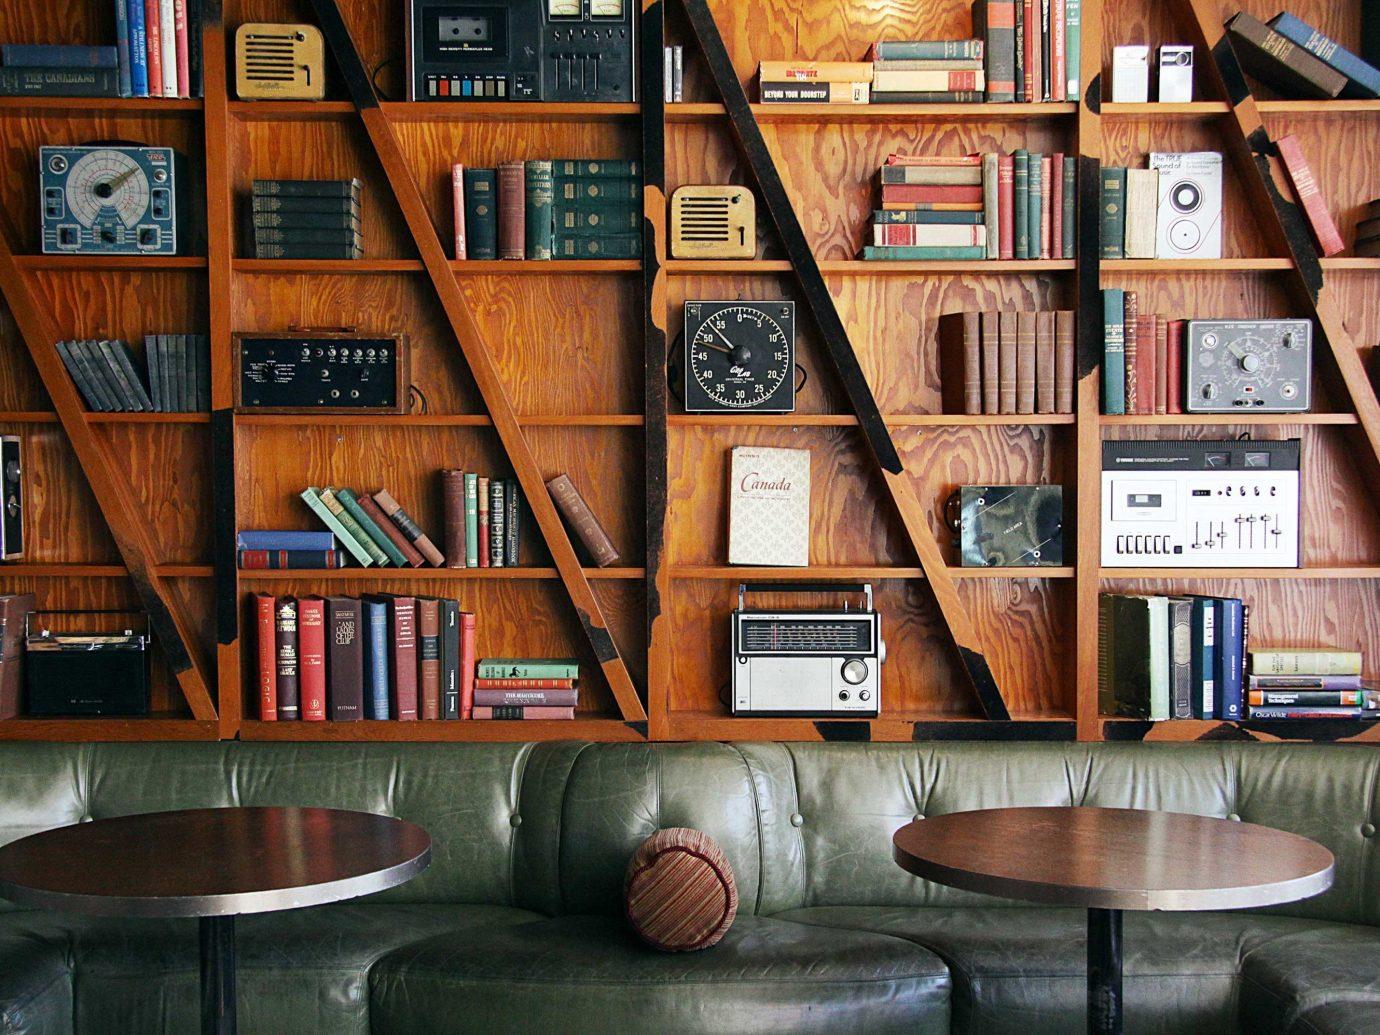 Girls Getaways Trip Ideas Weekend Getaways shelf book indoor floor furniture library building interior design home wood shelving living room bookshelf